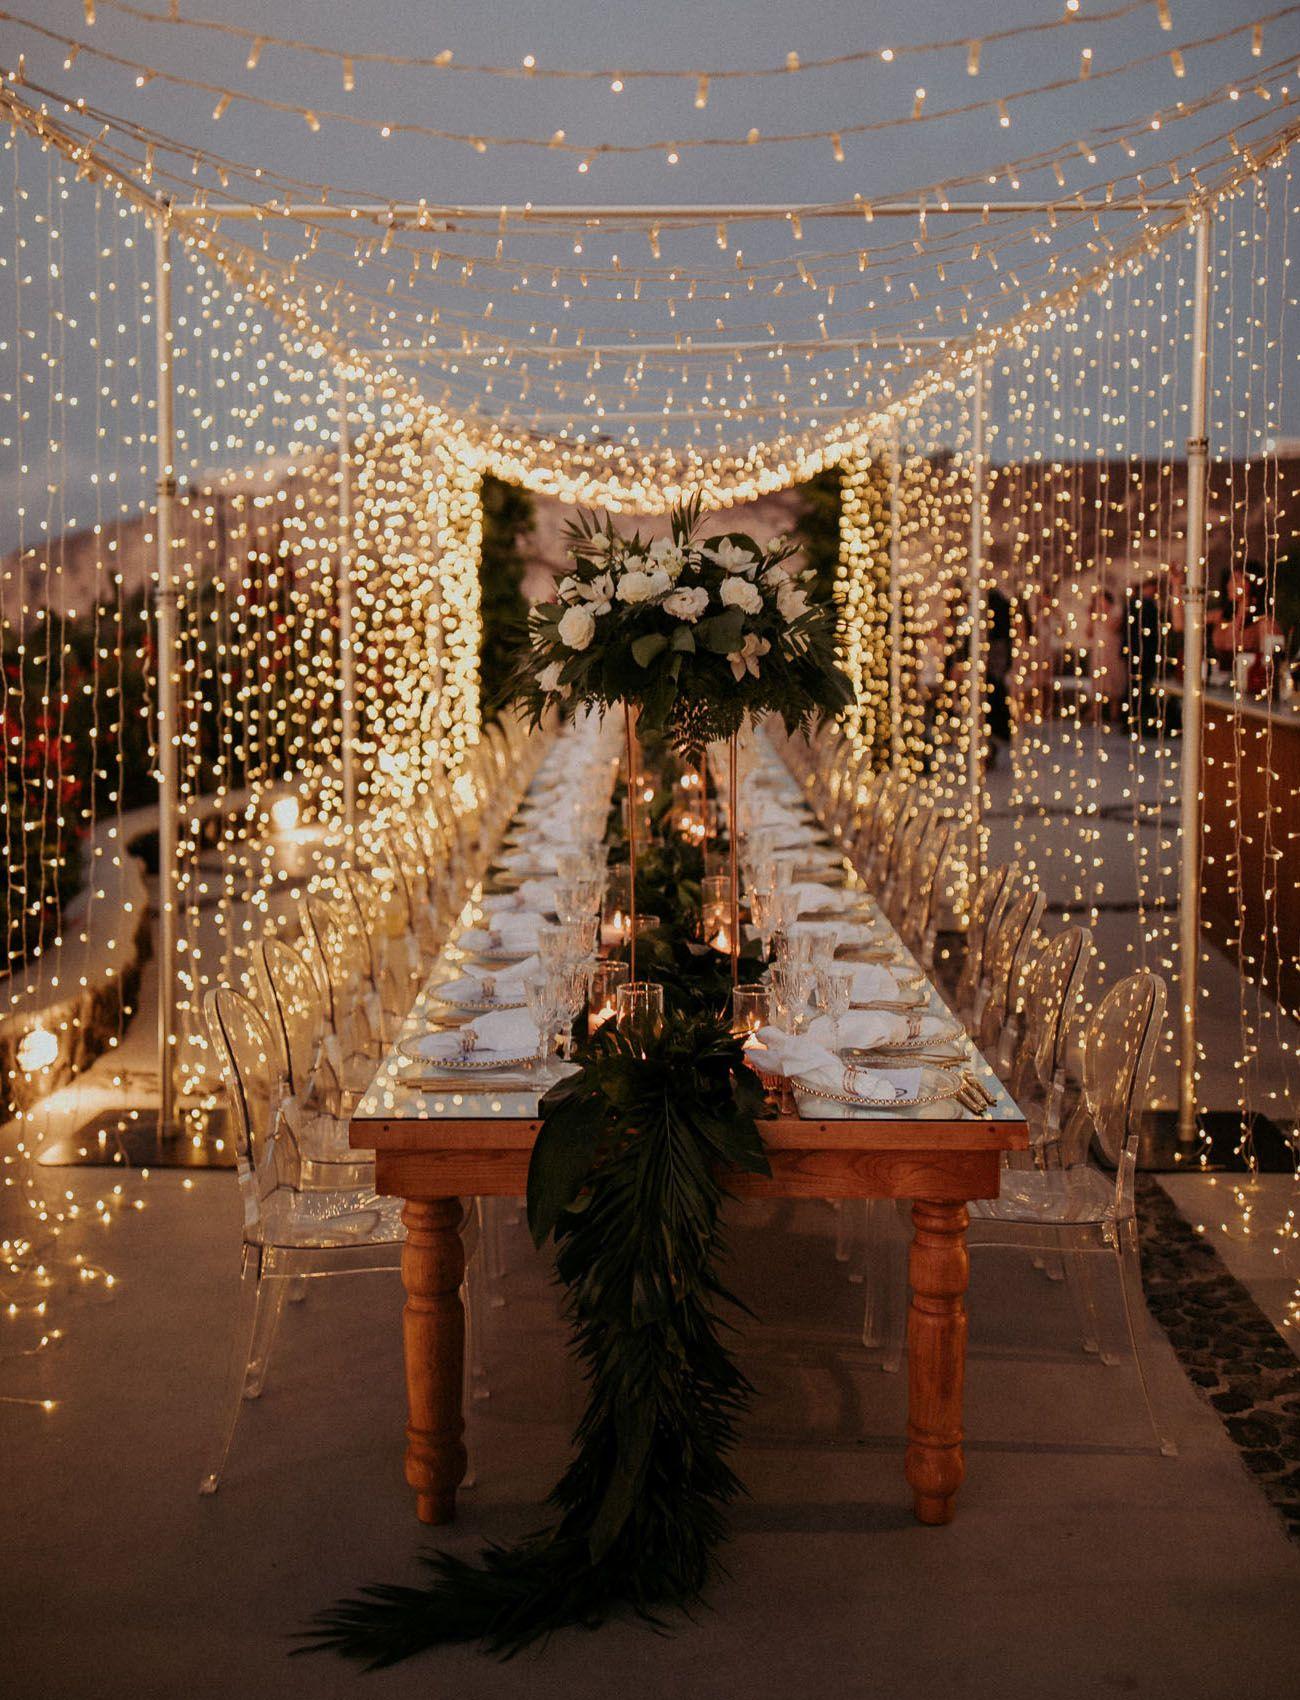 A Magical Santorini Wedding with Fairy Lights + Tropical Florals #fairylights